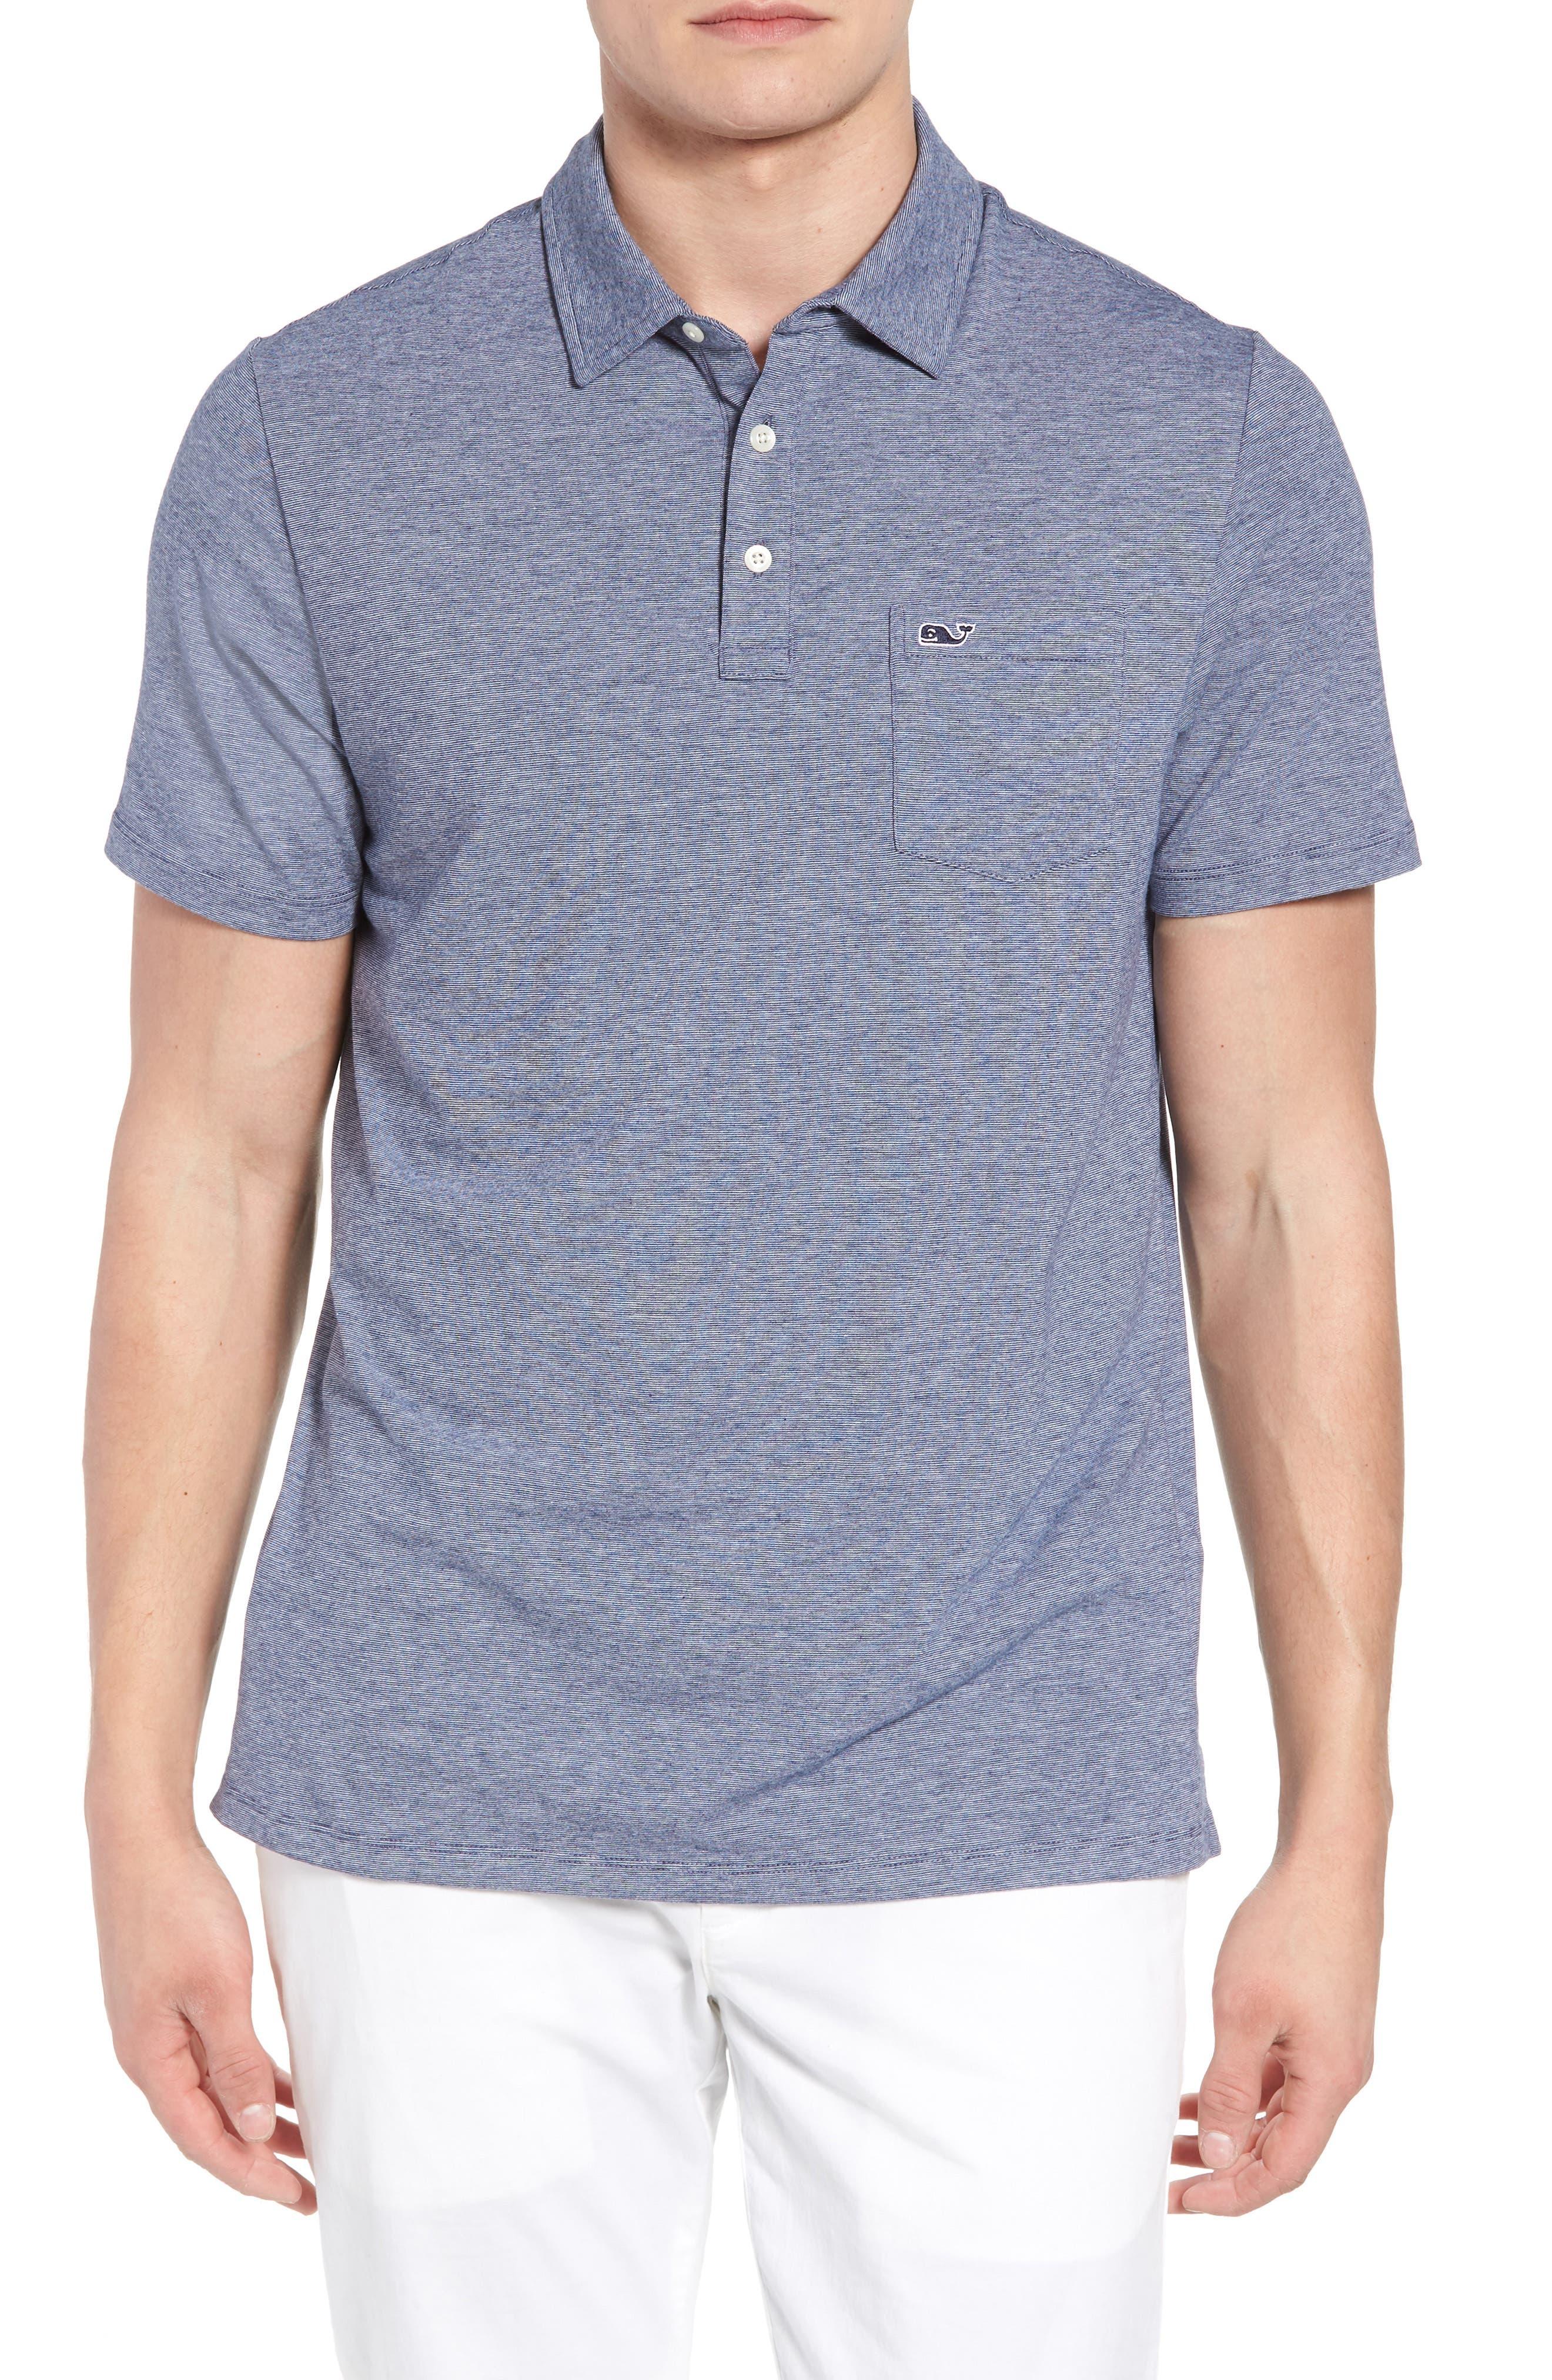 VINEYARD VINES Edgartown Polo Shirt, Main, color, DEEP BAY